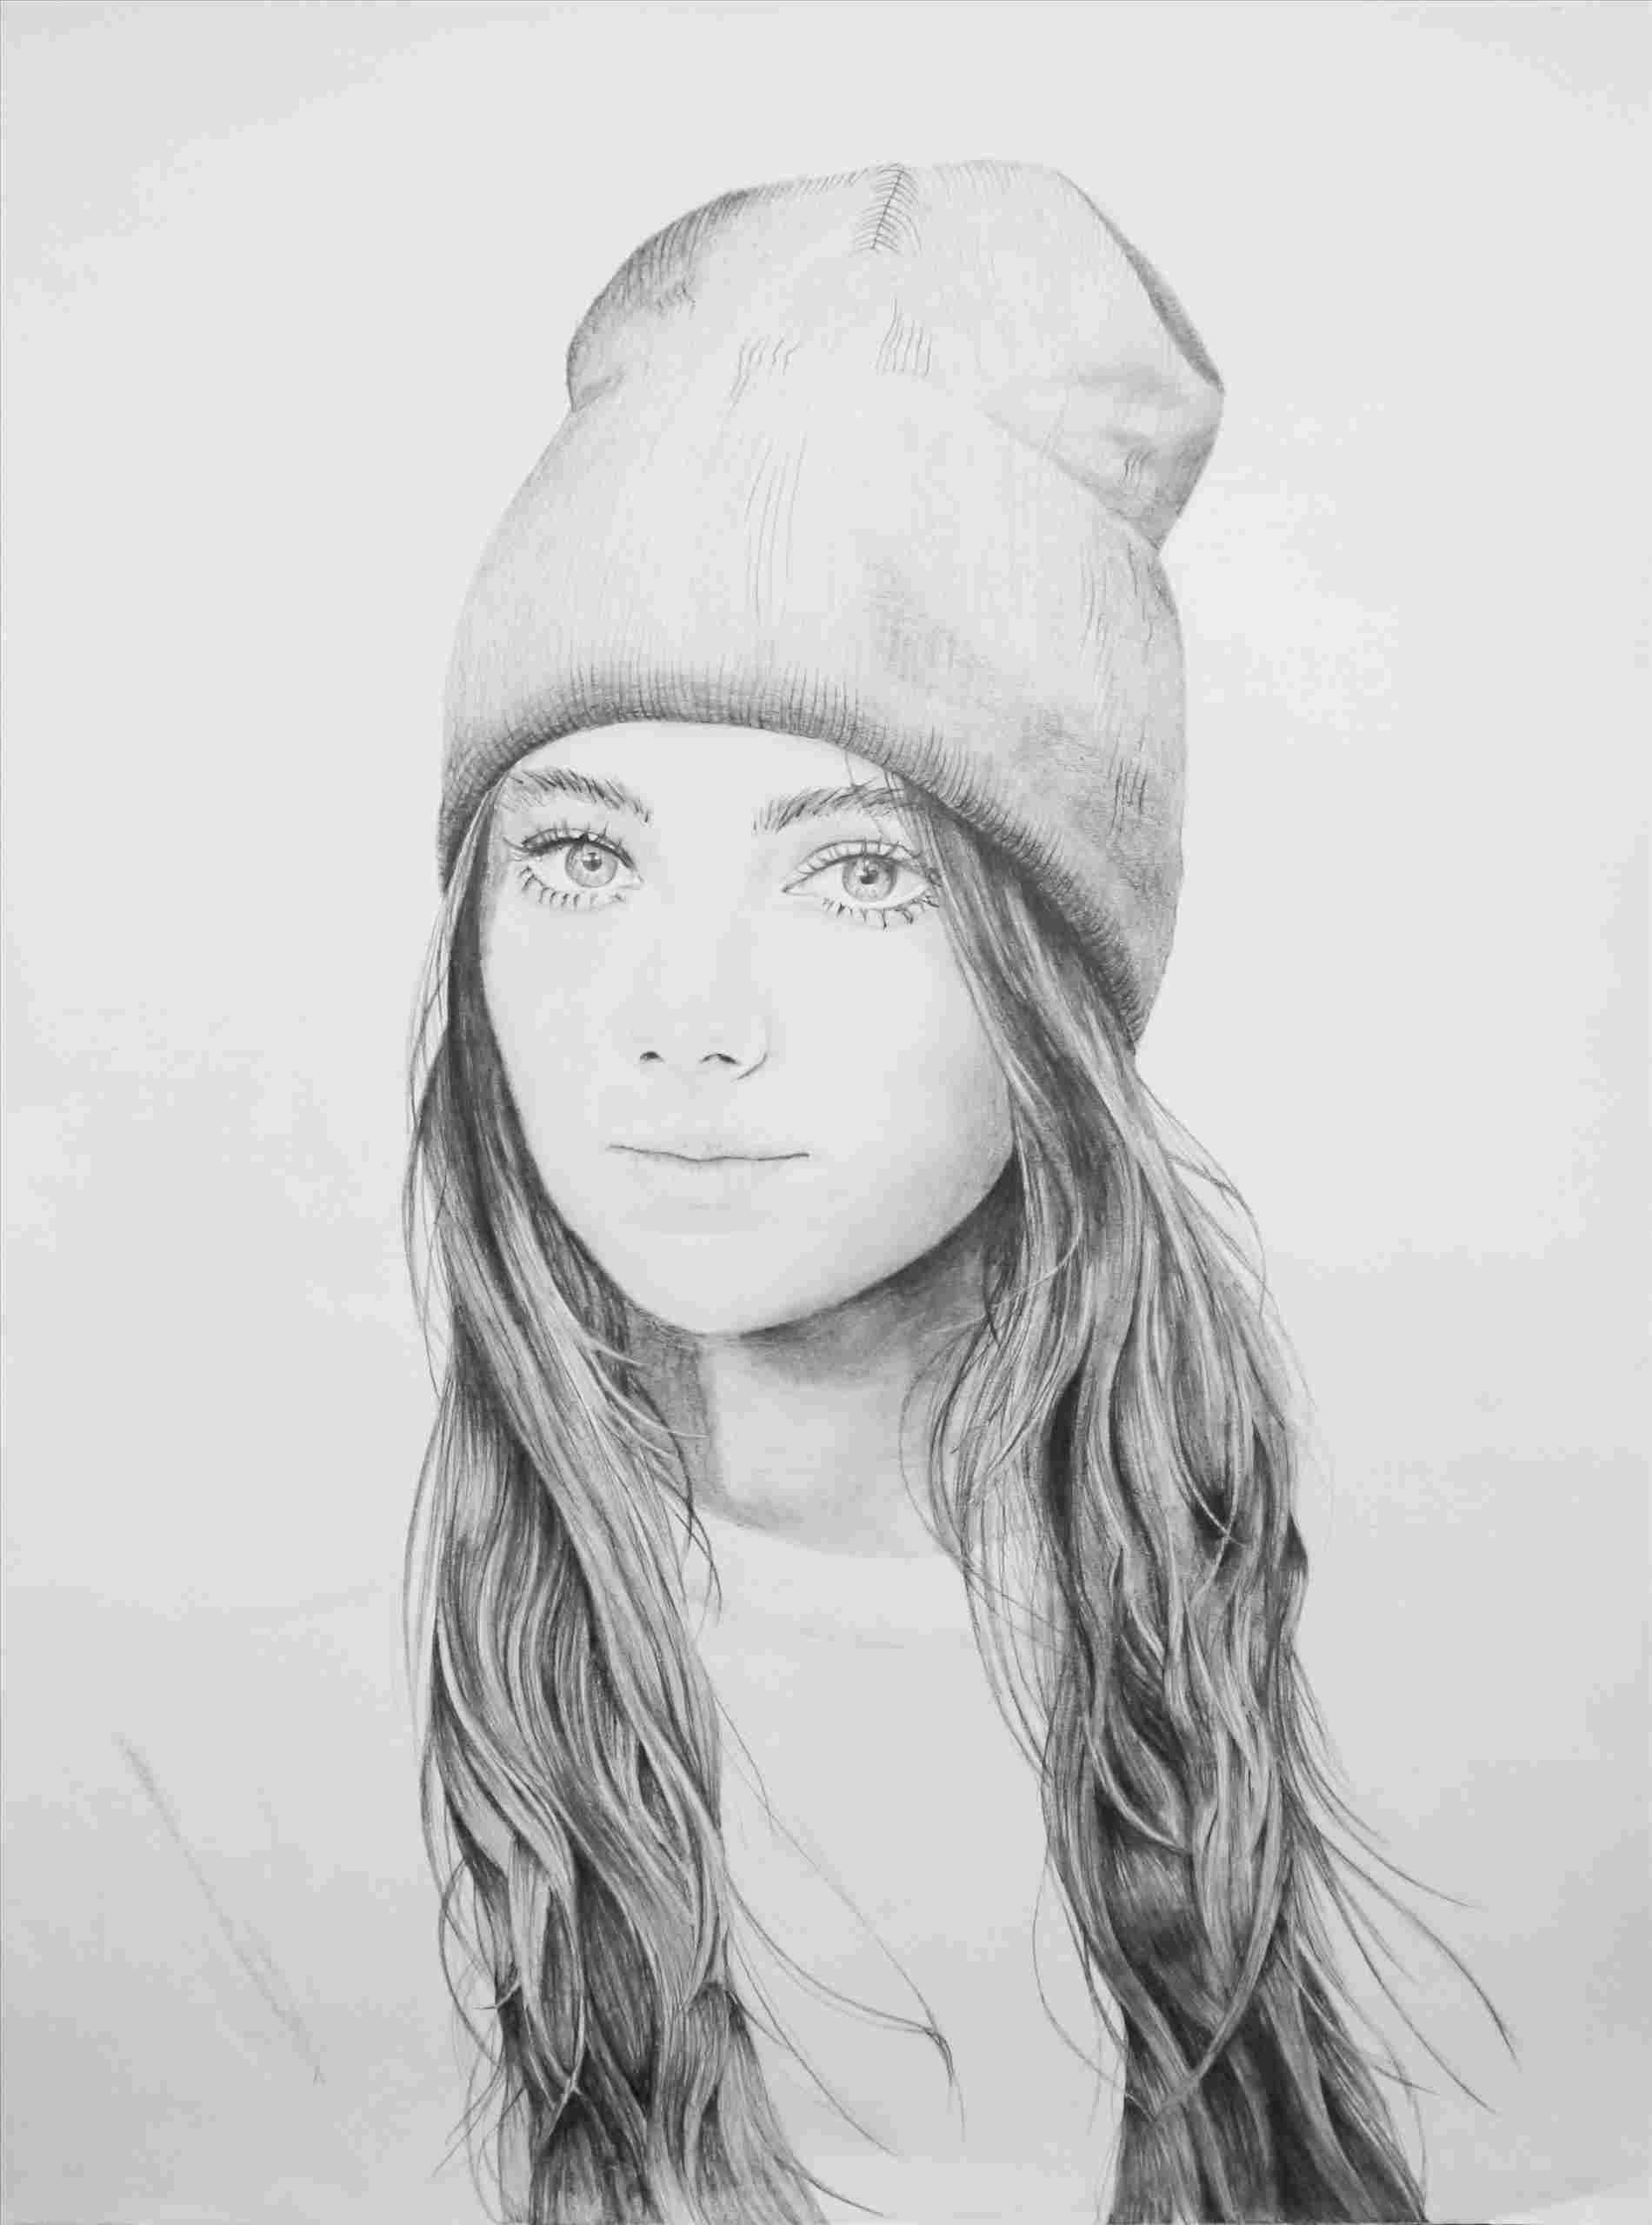 drawings to draw a little us facehead step by rhpinterestcom pin od zuzia na w pinterest art i artworkrhpinterestcom pin cute realistic girl drawings od zuzia jpg